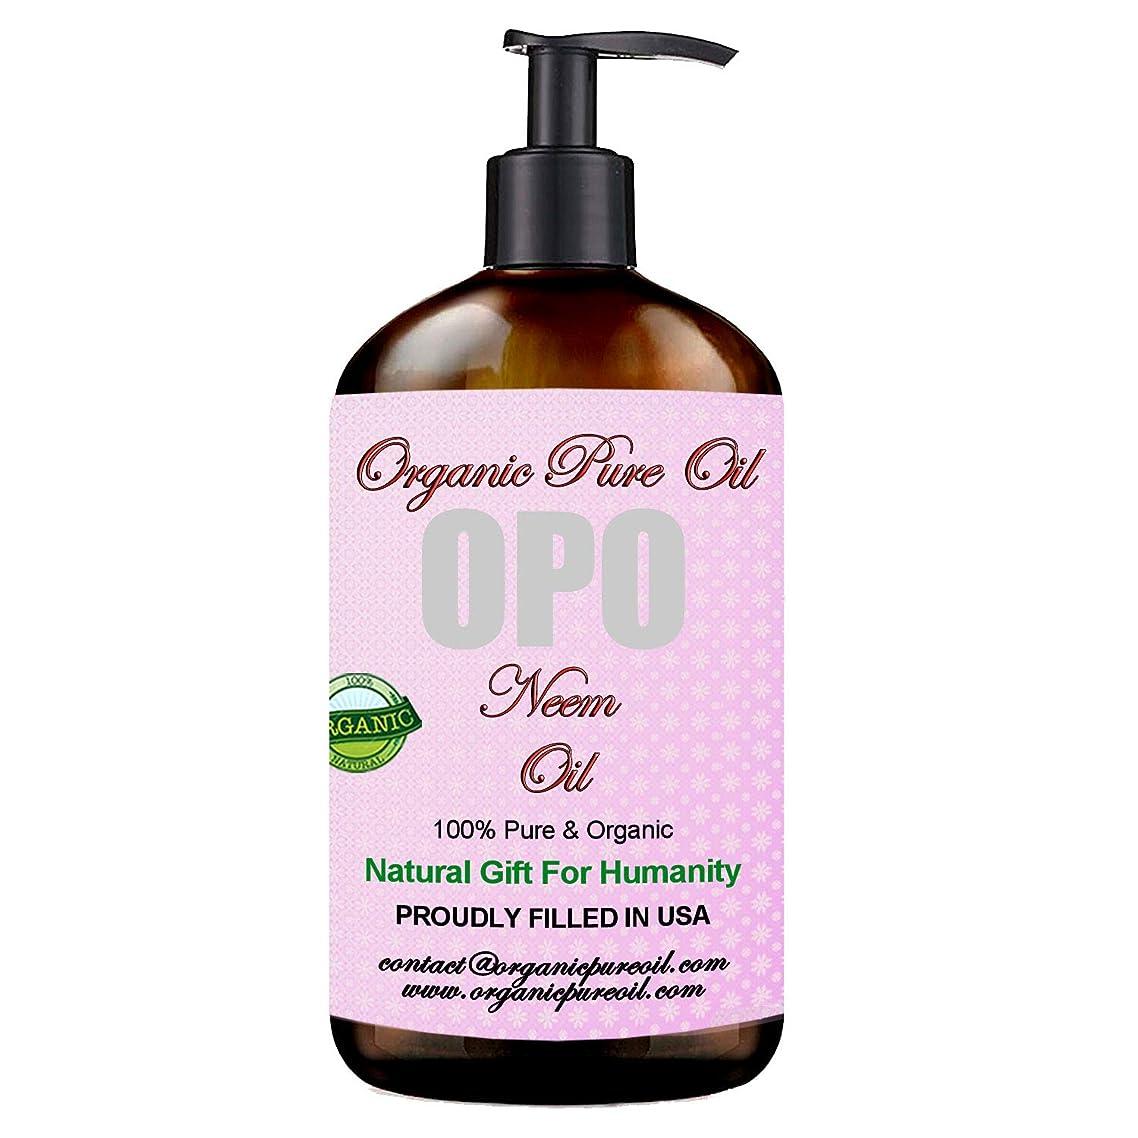 Neem Oil 8 oz - 100% Pure, Organic, All Natural, Pharmaceutical Grade Neem Oil Perfect for Hair, Skin, Scalp, Body Care Moisturizer